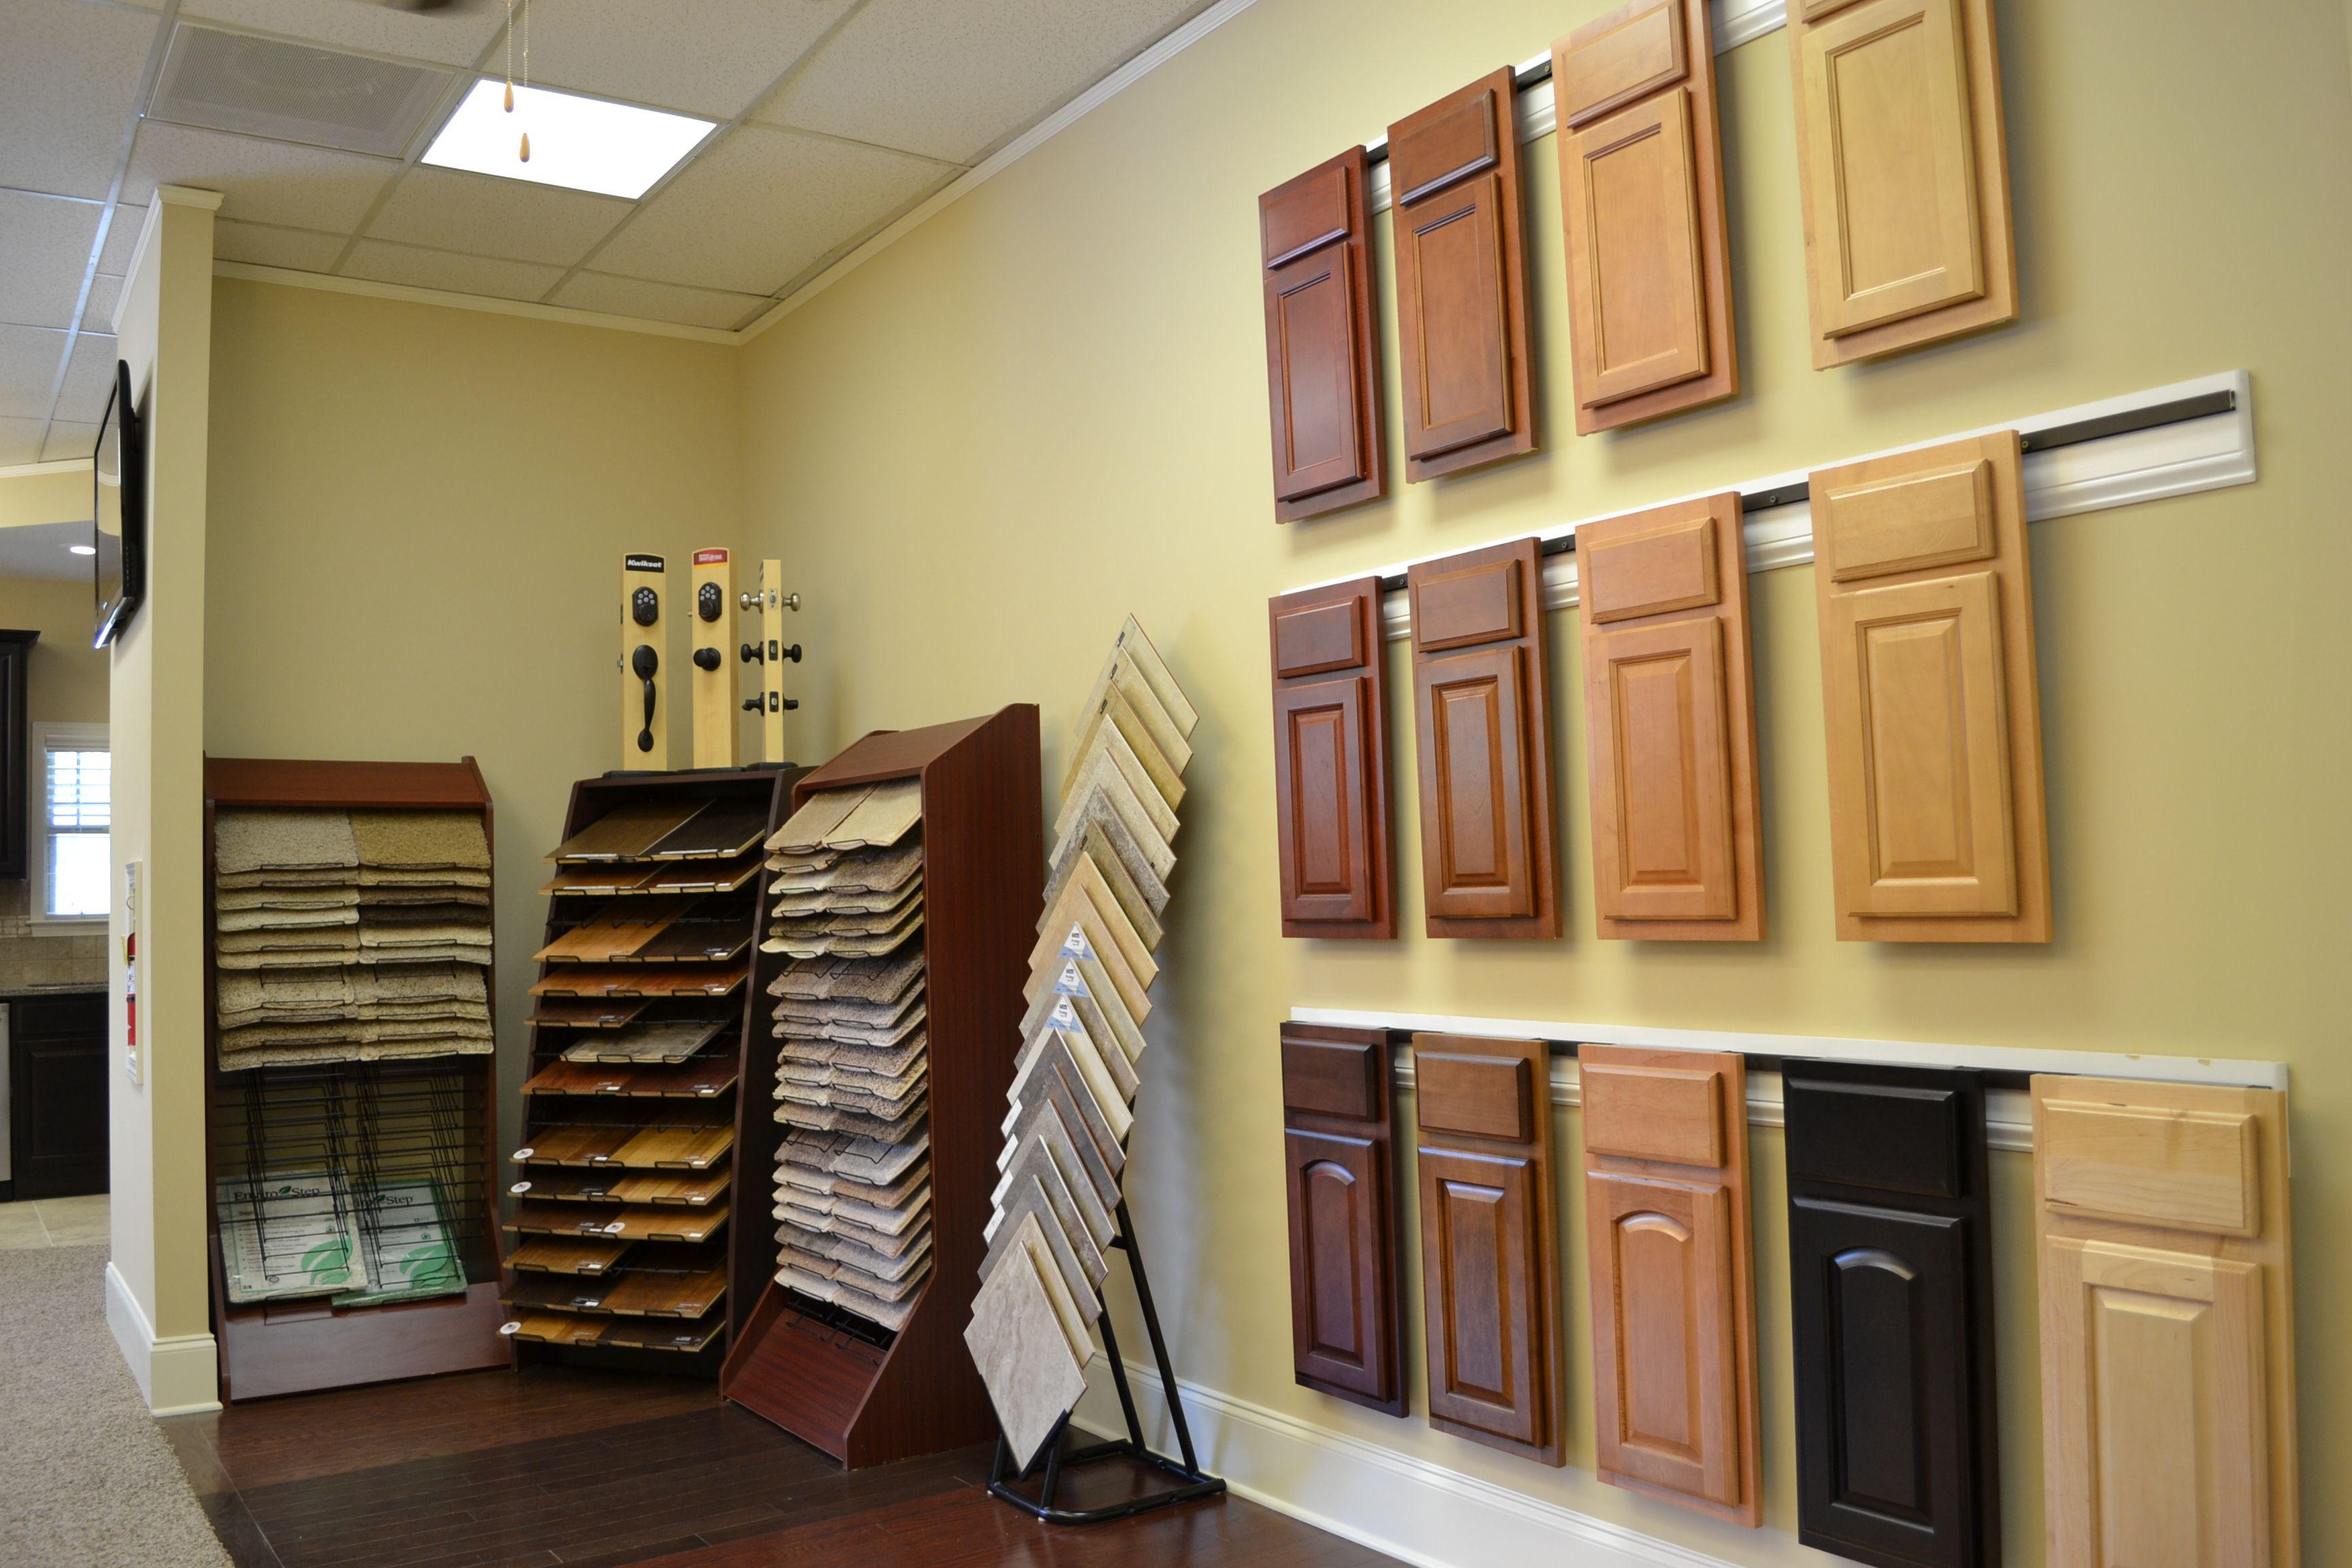 Come And Visit Our New Showroom At 2301 Airport Thruway In Columbus Ga Www Grayhawkhomesinc Com Cabinet Door Styles Cabinet Doors Showroom Design